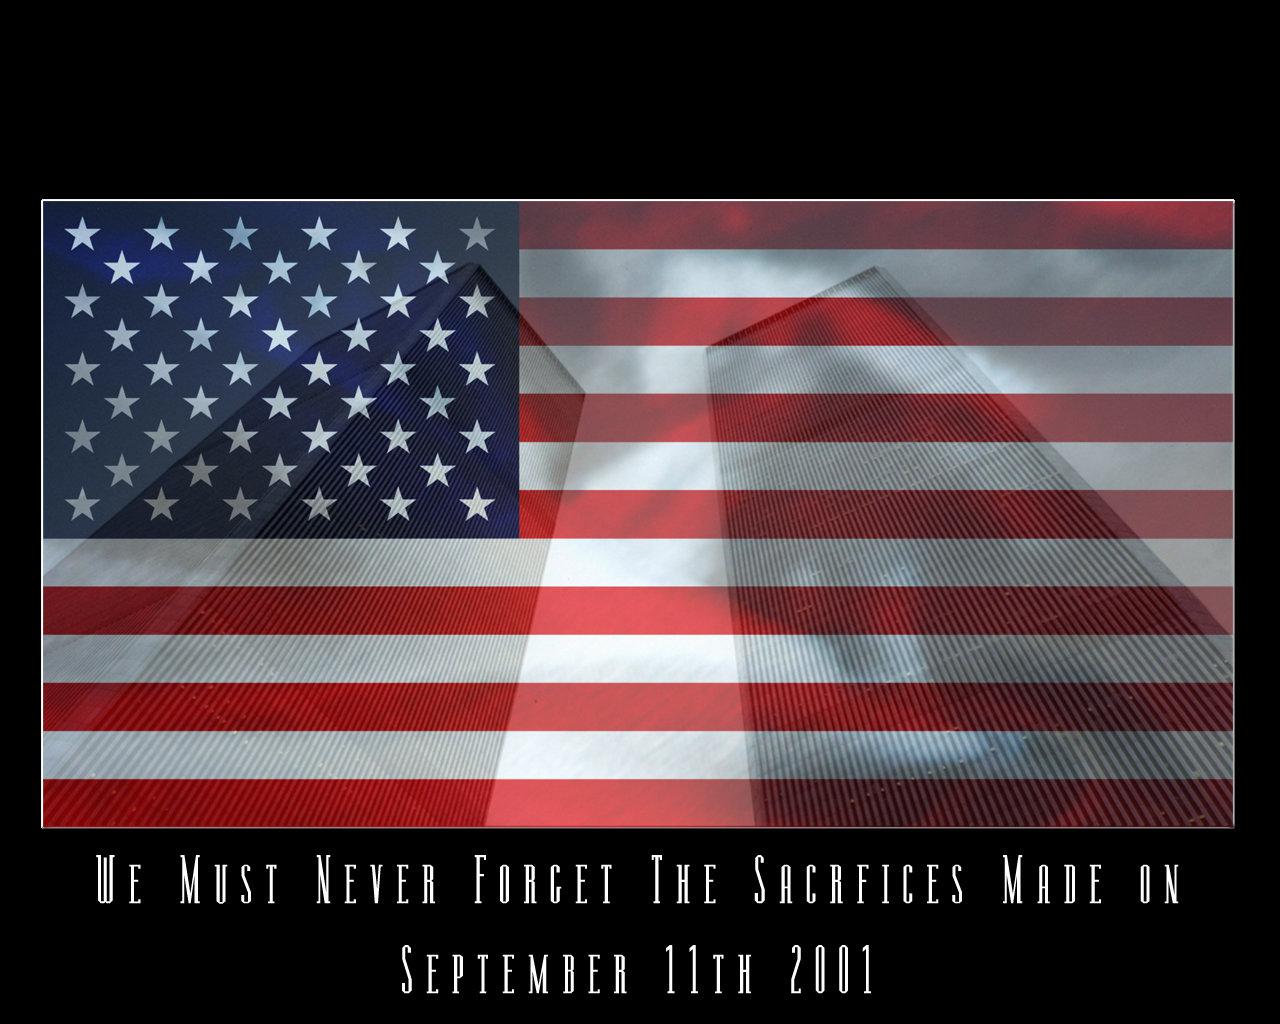 September 11th Wallpaper Pack by Hessmix 1280x1024